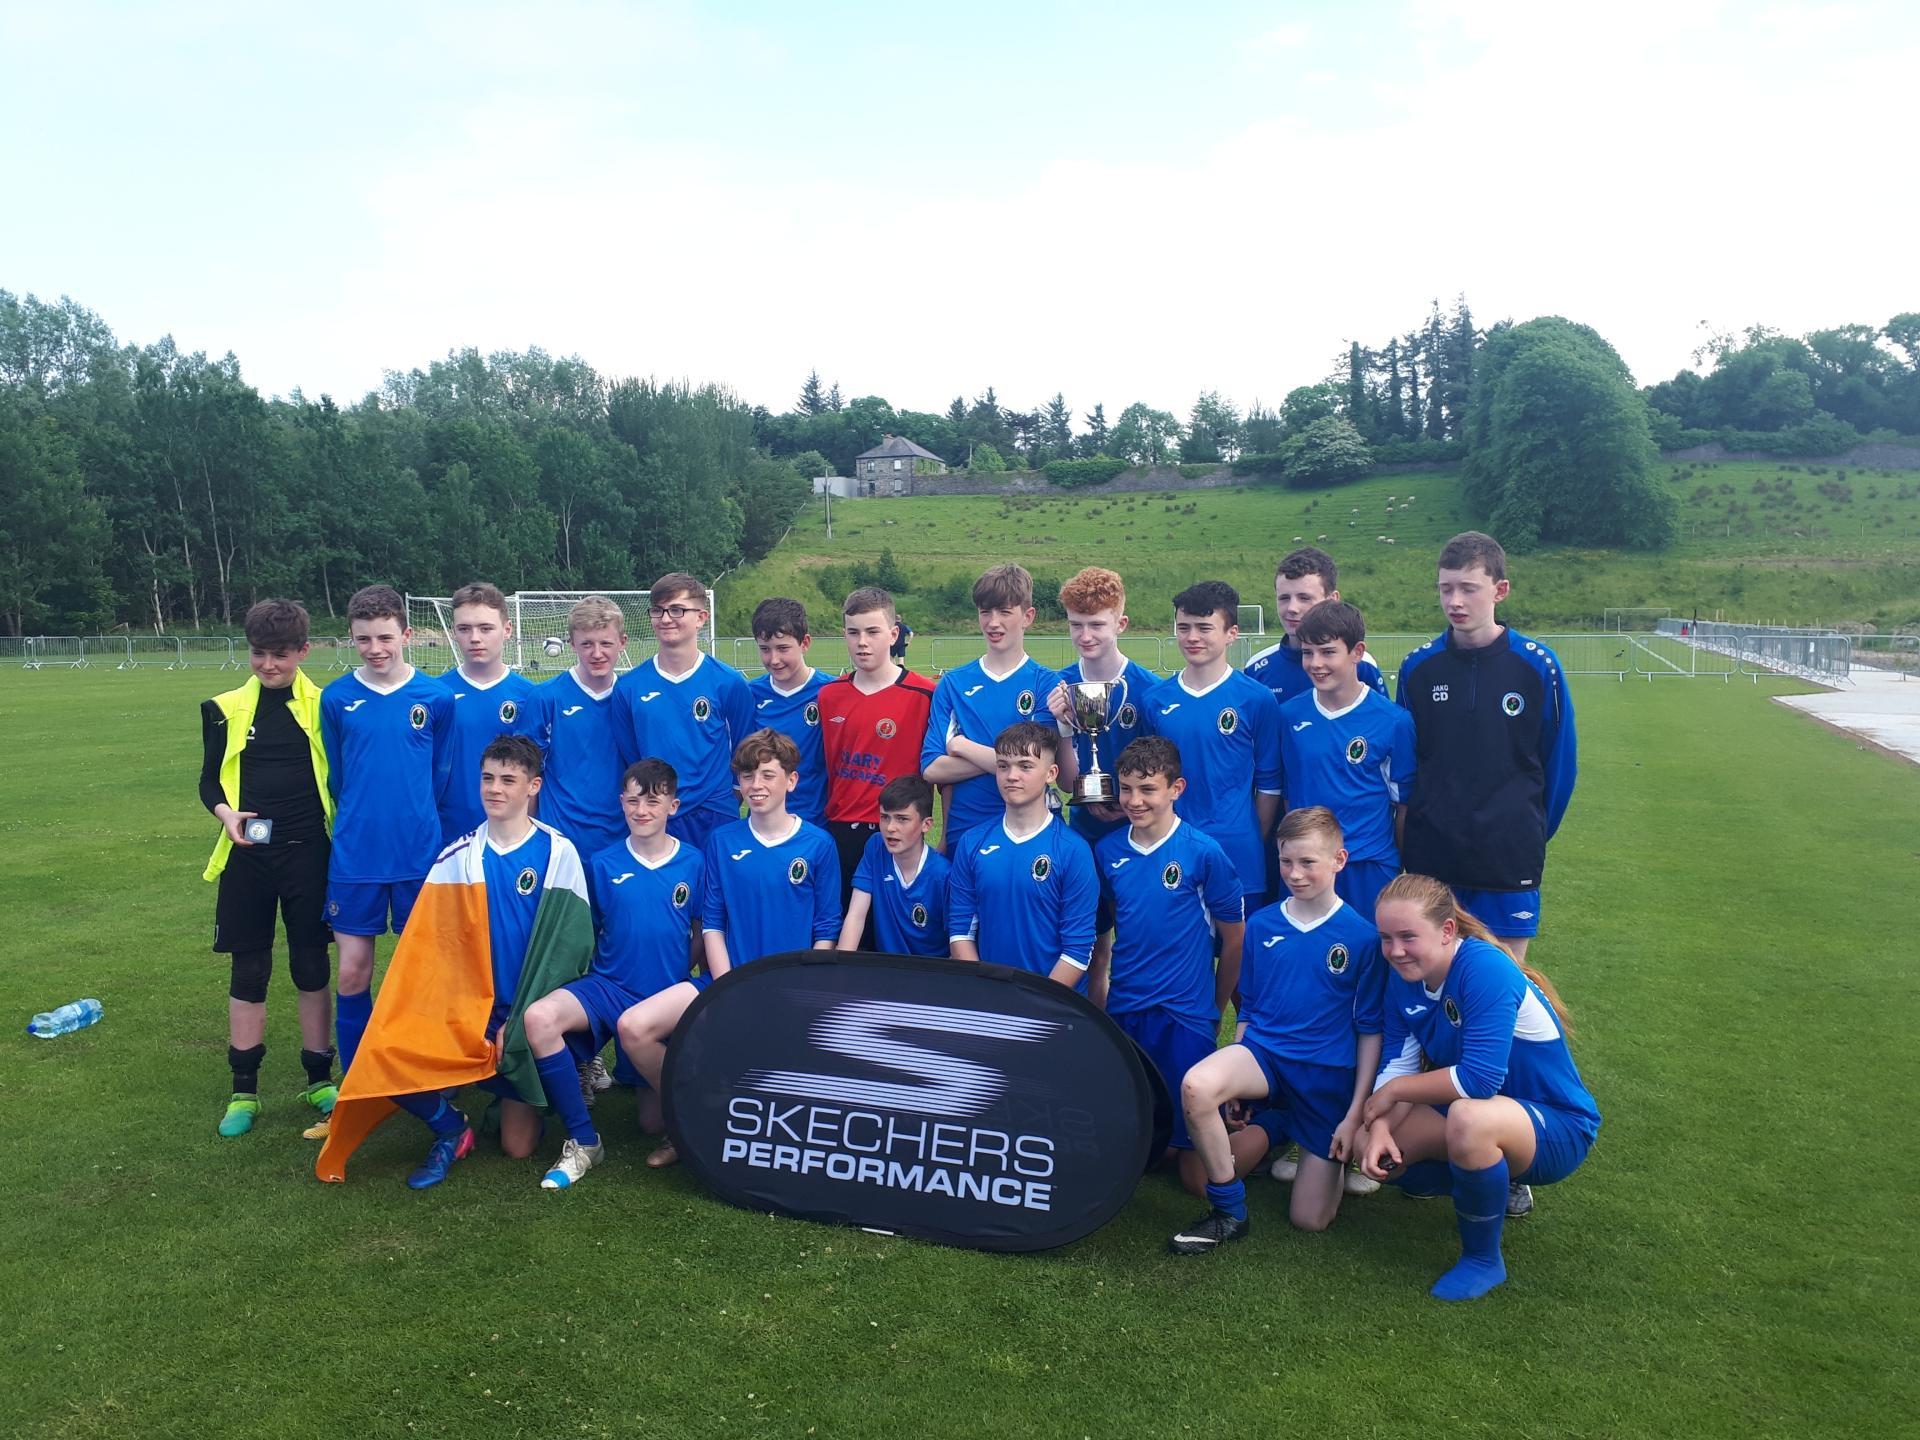 Ballyhaunis Community School record big win over Tuam